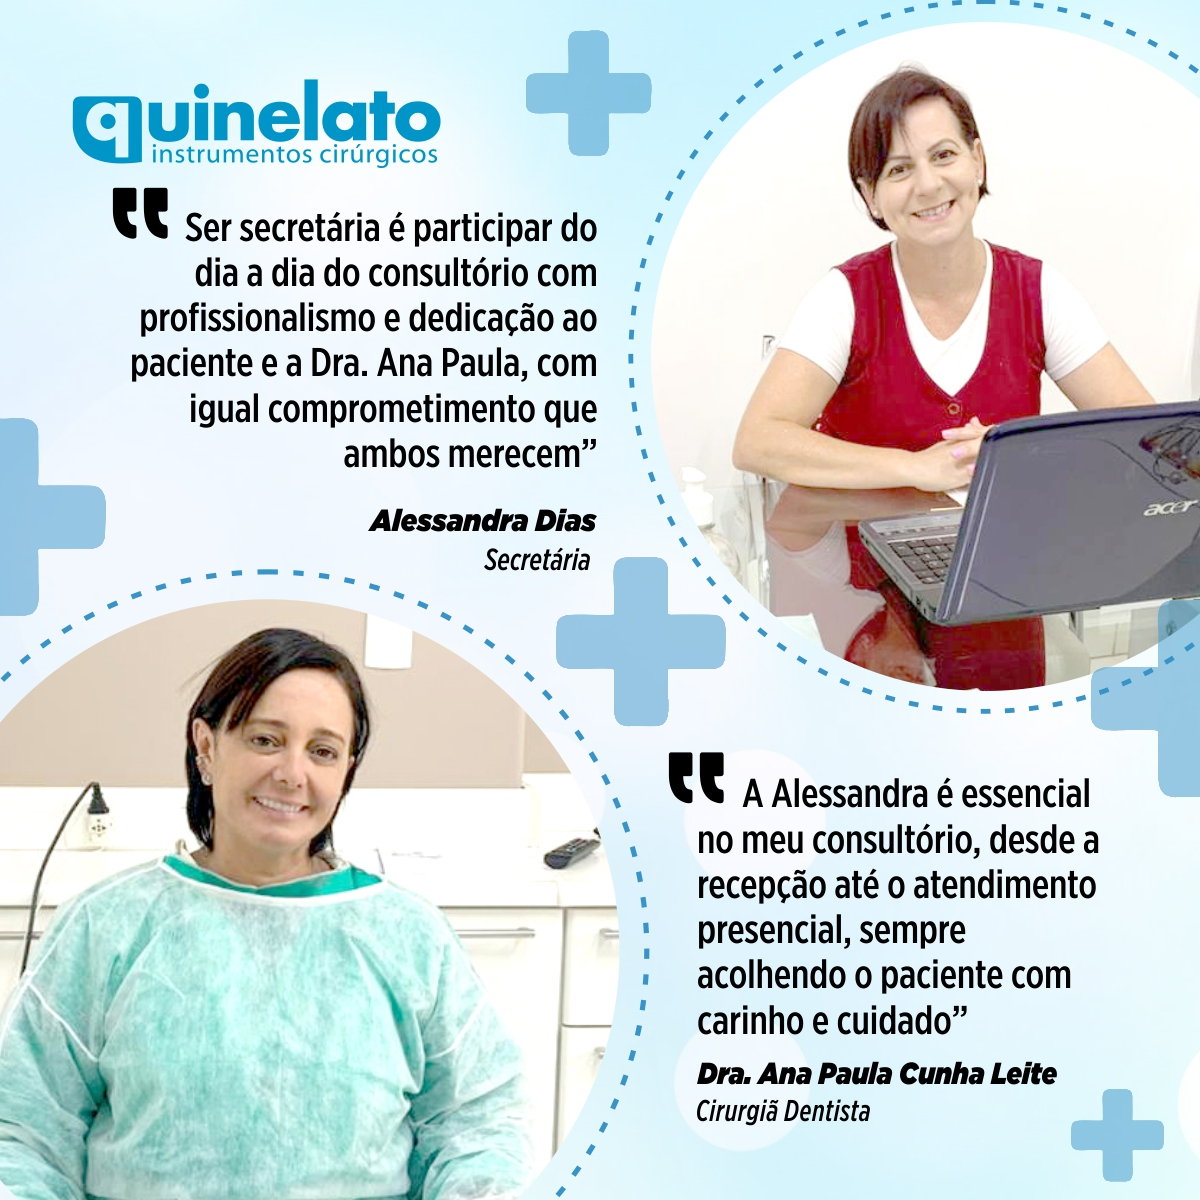 Dra. Ana Paula Cunha Leite